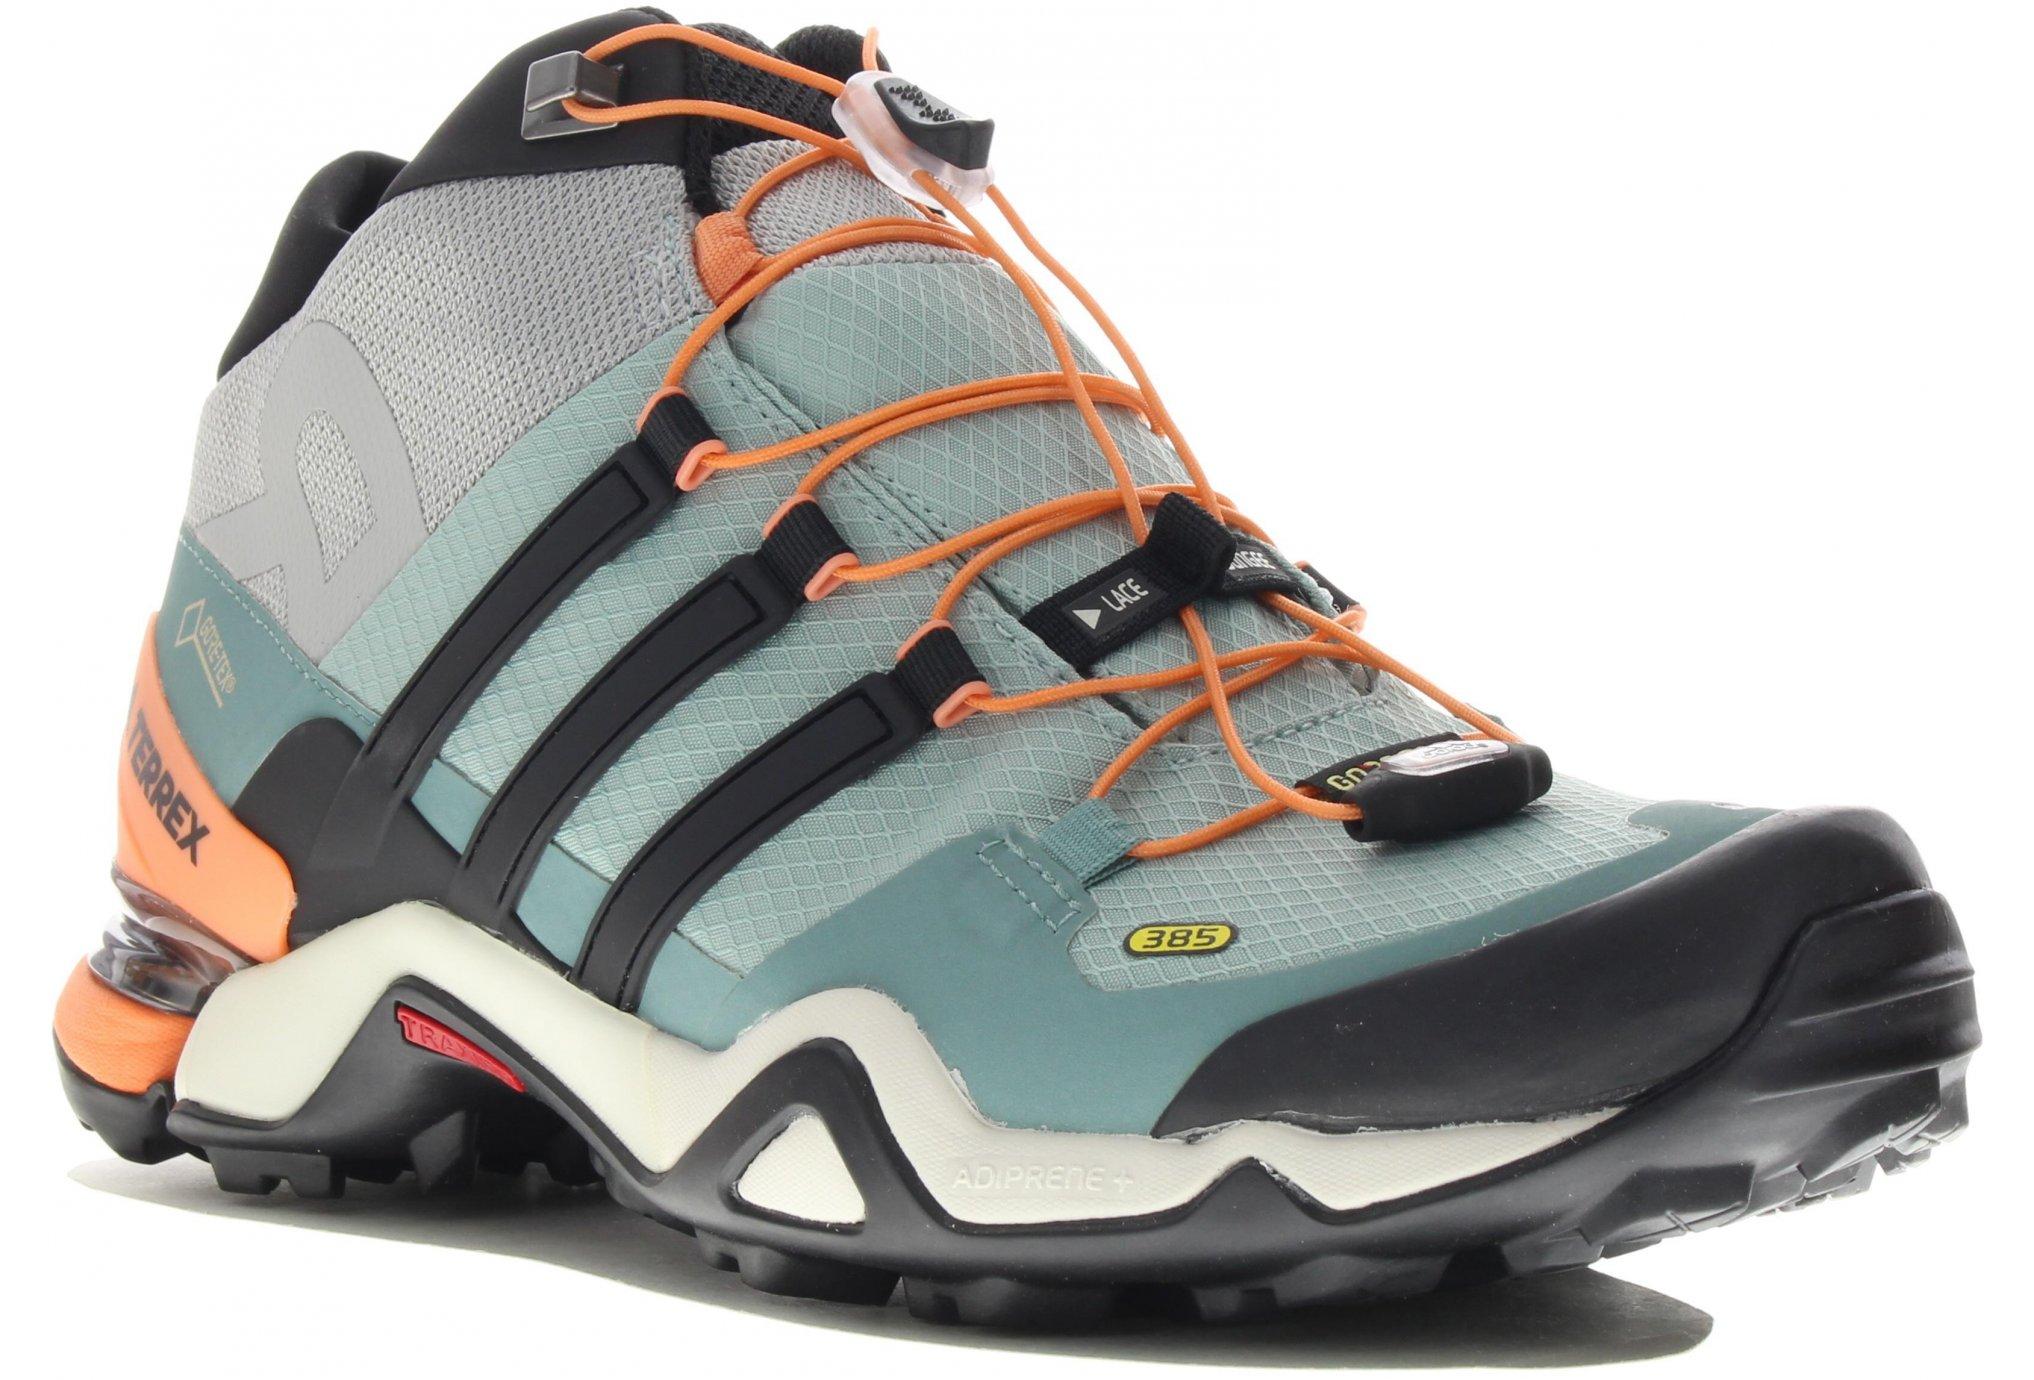 Et Running Adidas Trail Femme In Liste Produits W8xtcd De Chaussures Nnvw80m